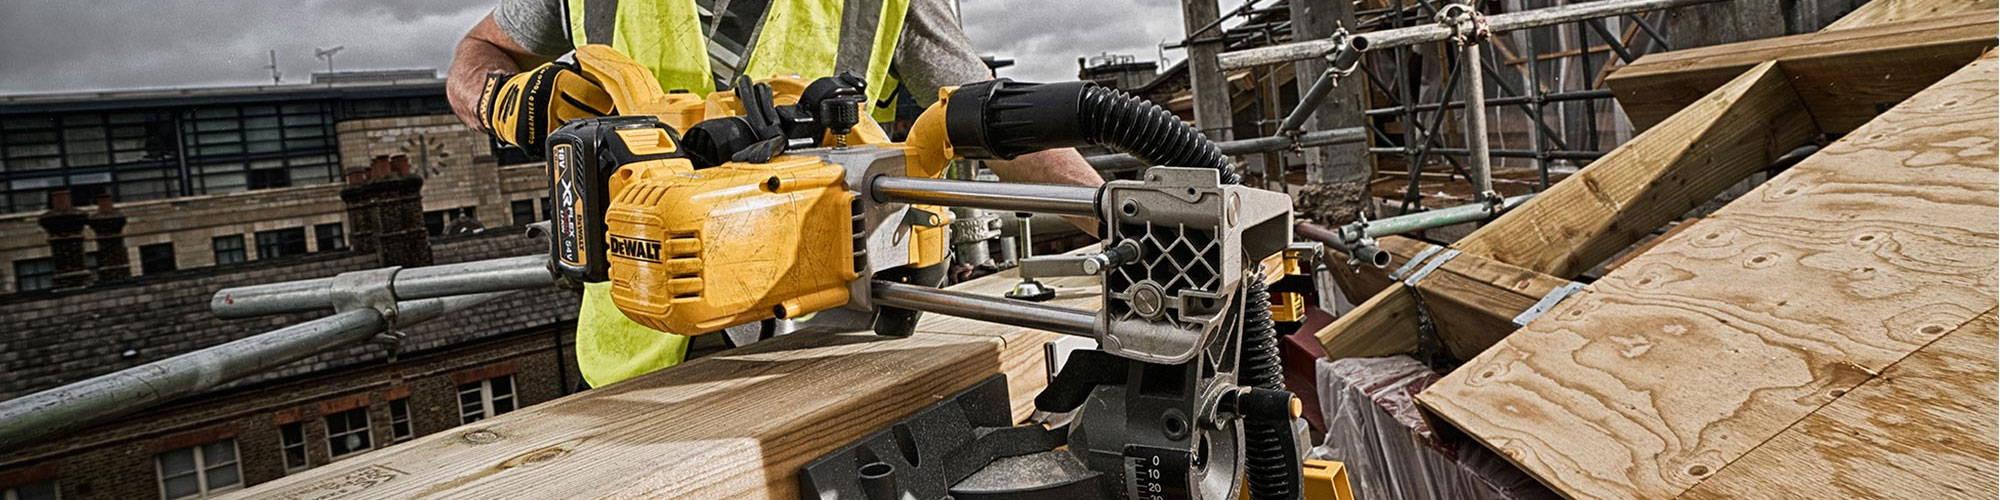 DCS778 Dewalt 54V Mitre Saw Review